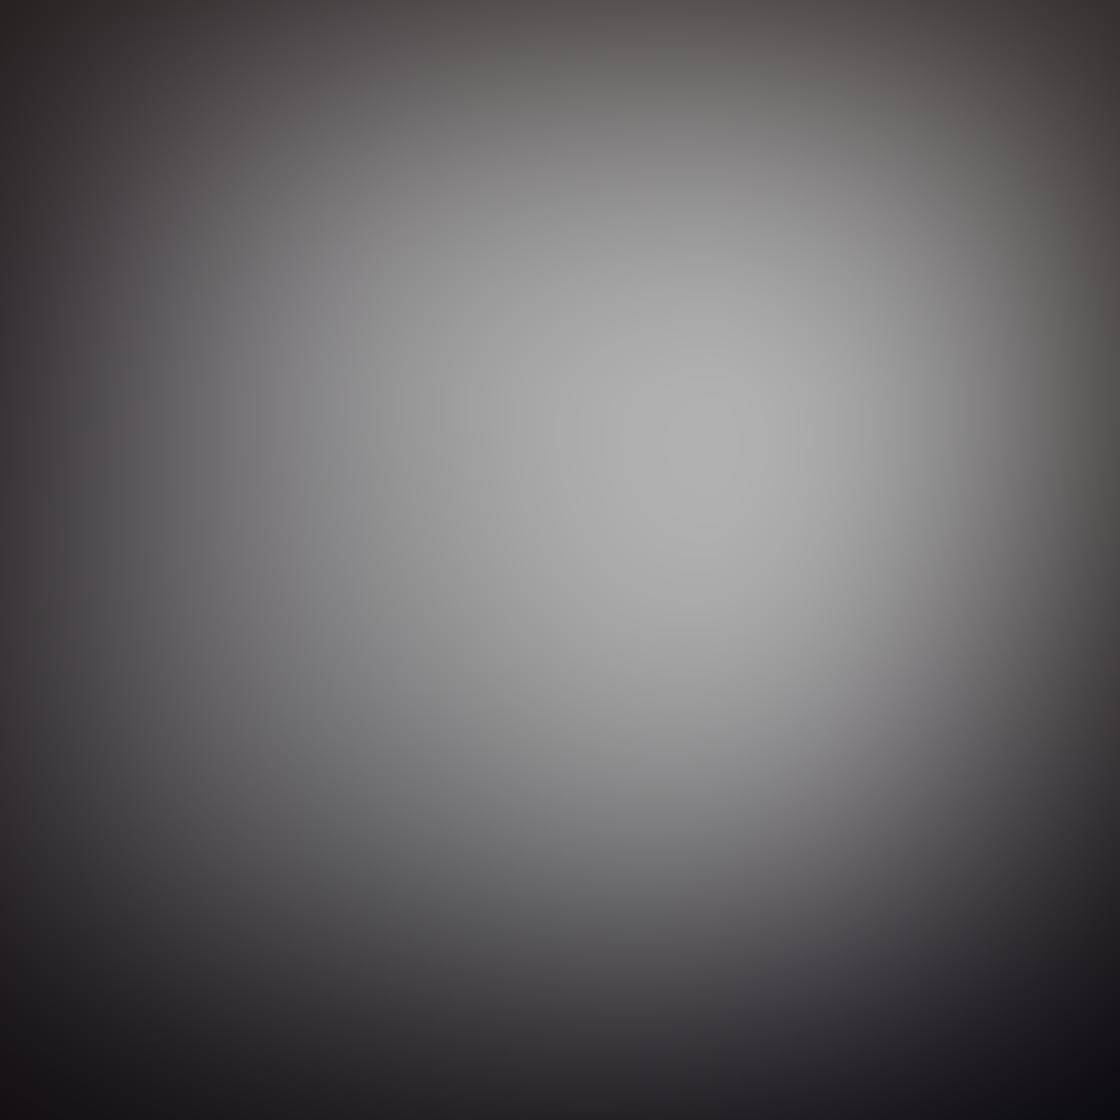 iPhone Silhouette Photos 12